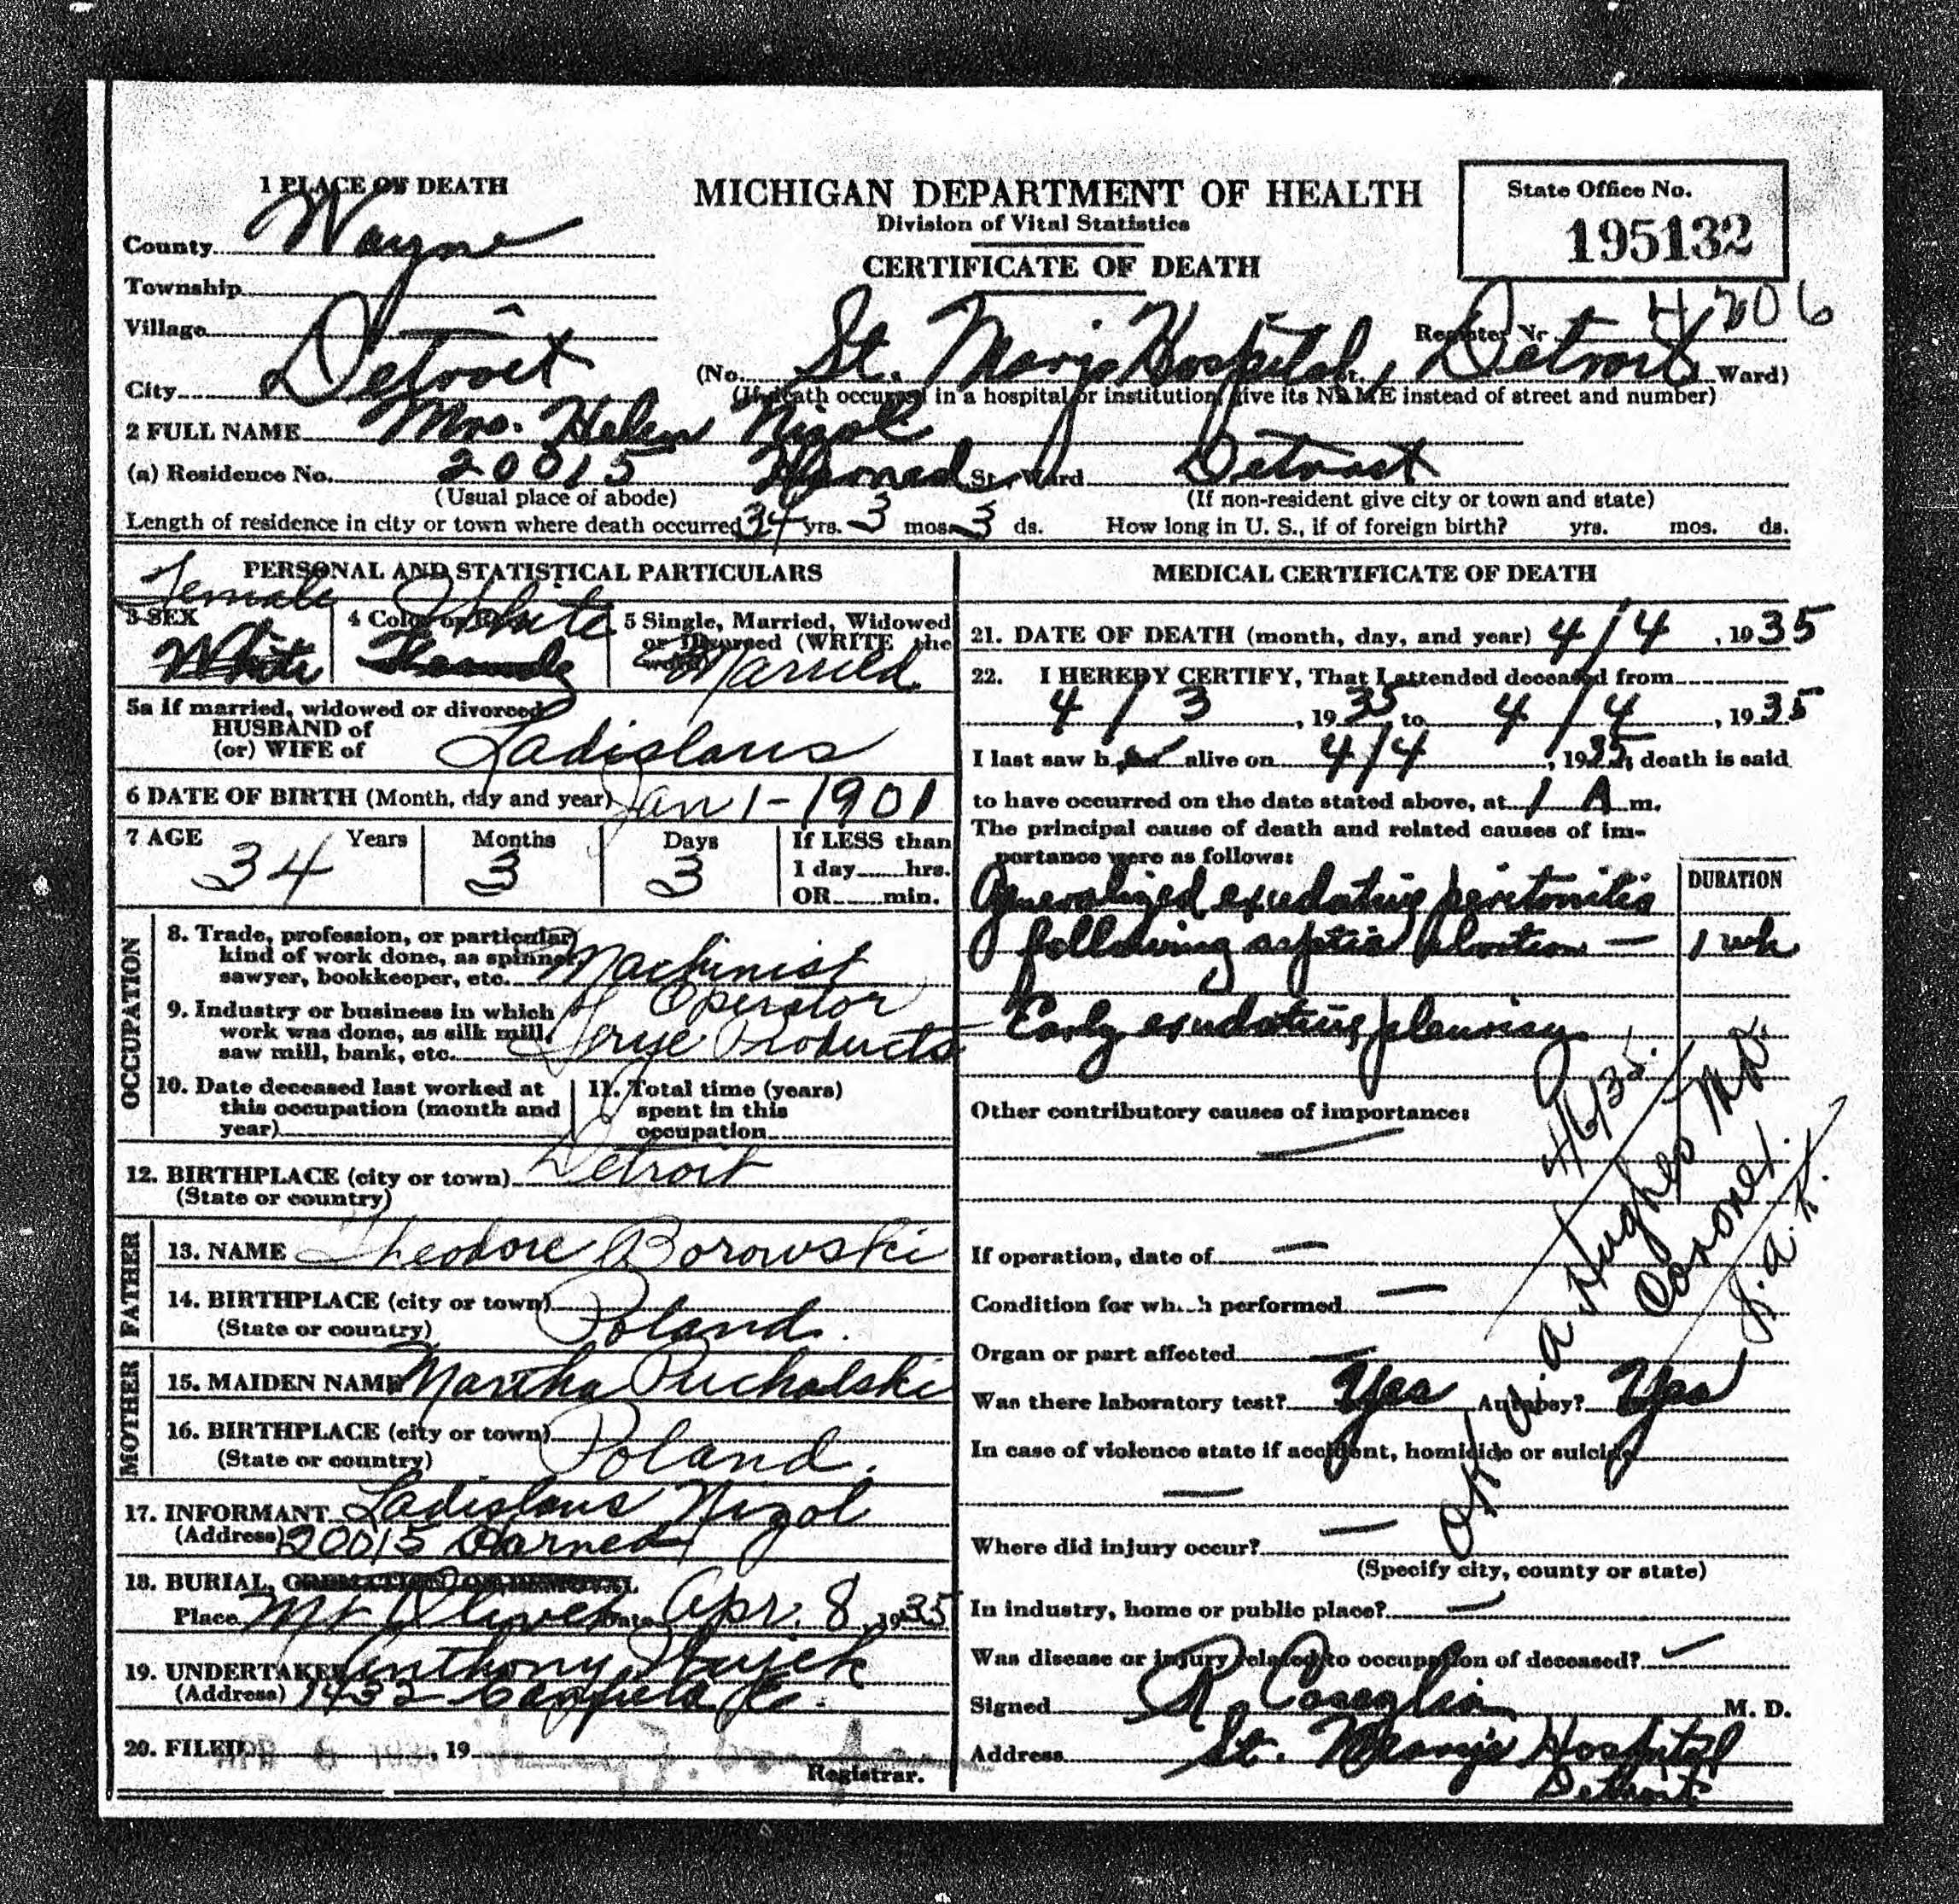 Helen Borowski Nizol (1900-1935) death certificate